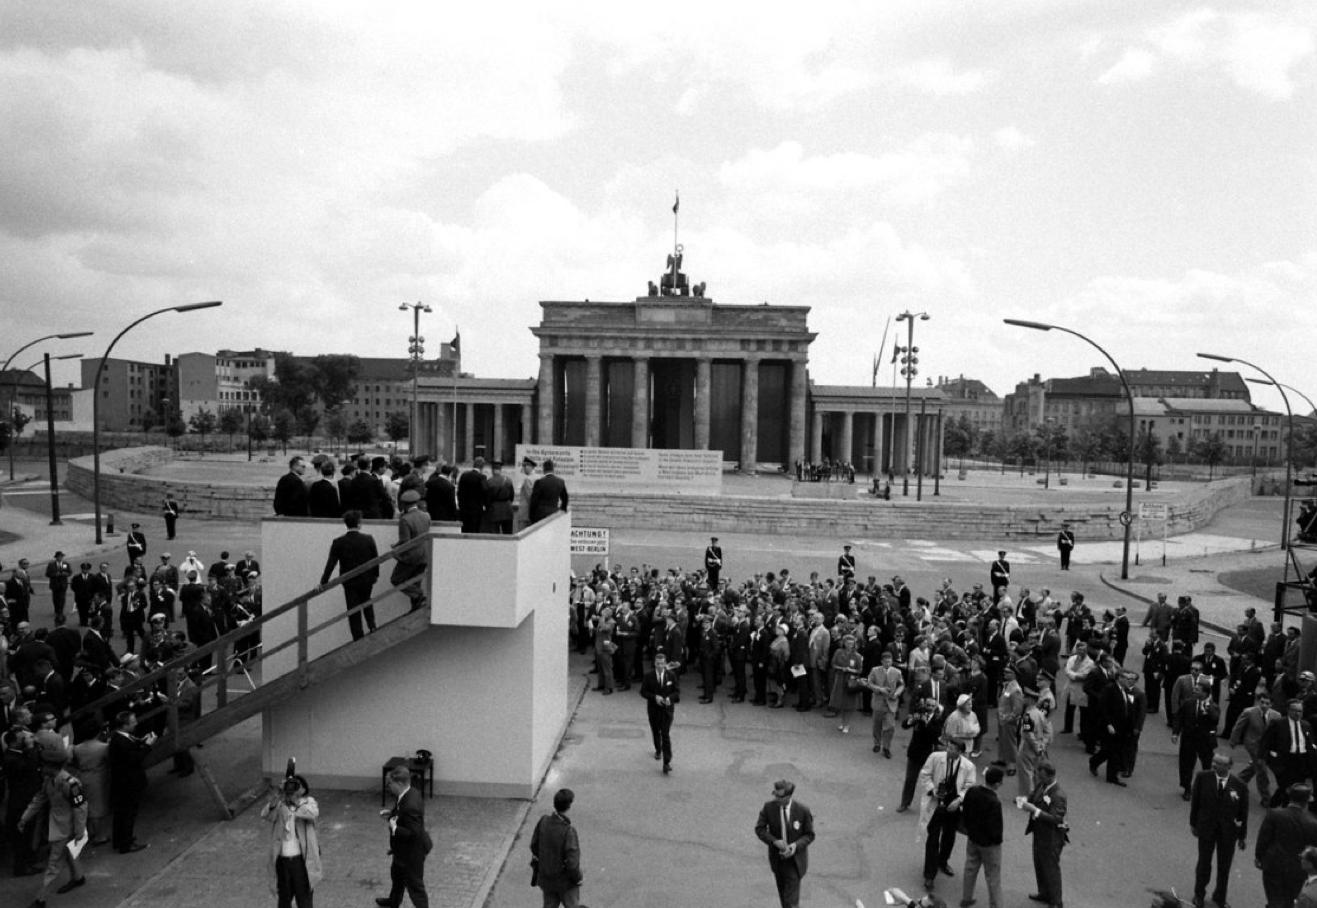 Ich Bin Ein Berliner Jfk In Berlin 1963 Www Lberger Ca Con Imagenes Historia